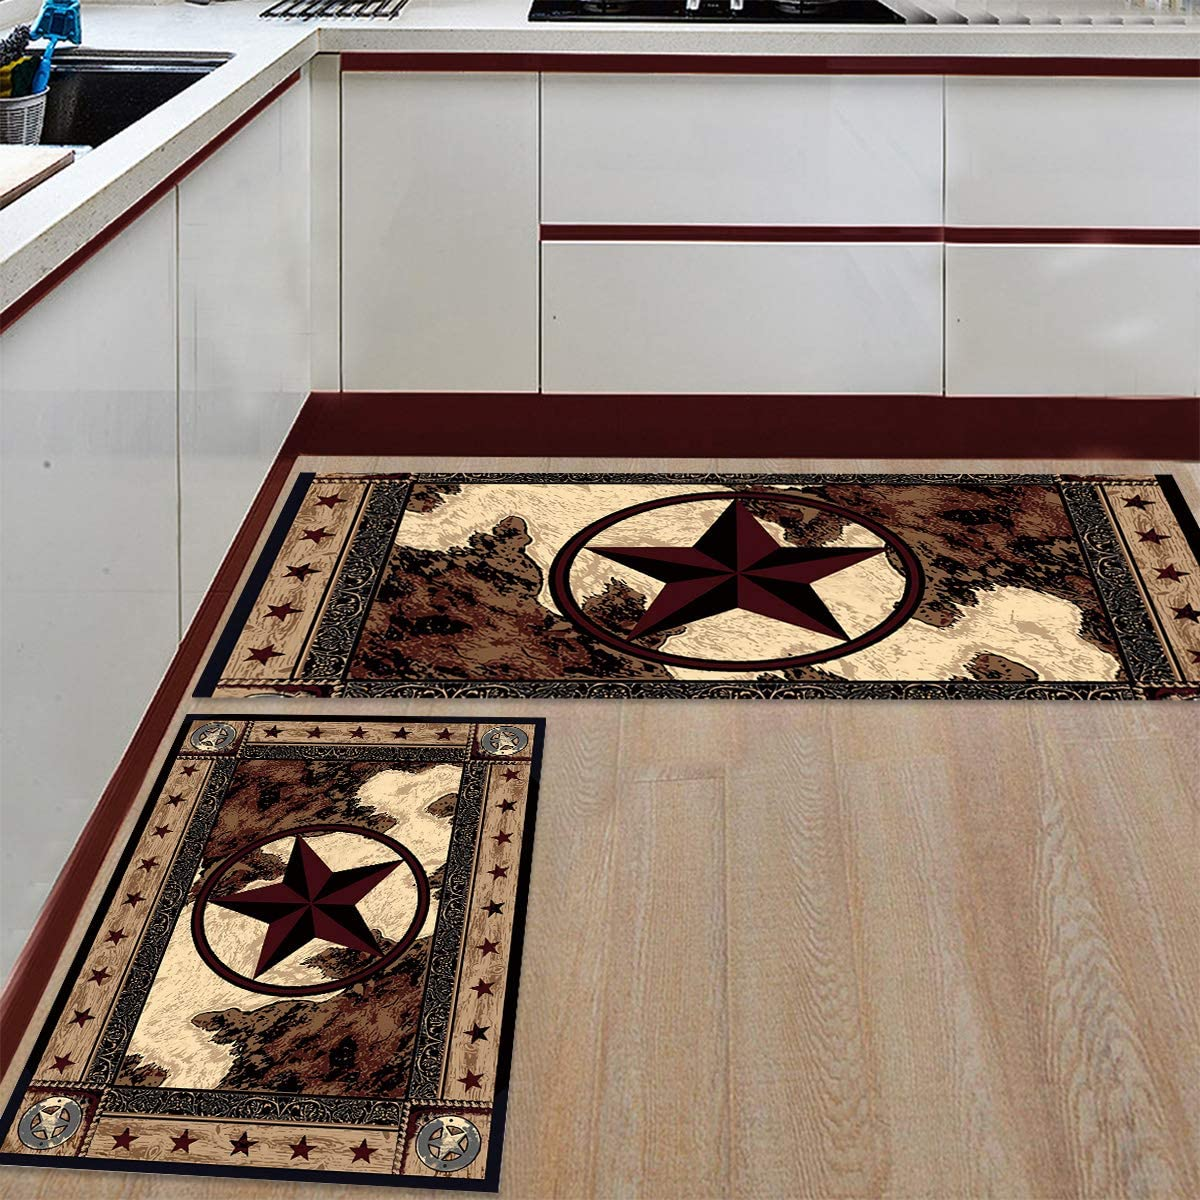 2 Pieces Detroit Mall Non-Slip Vintage Style Kitchen Rug overseas Sup Runner Bath Mat